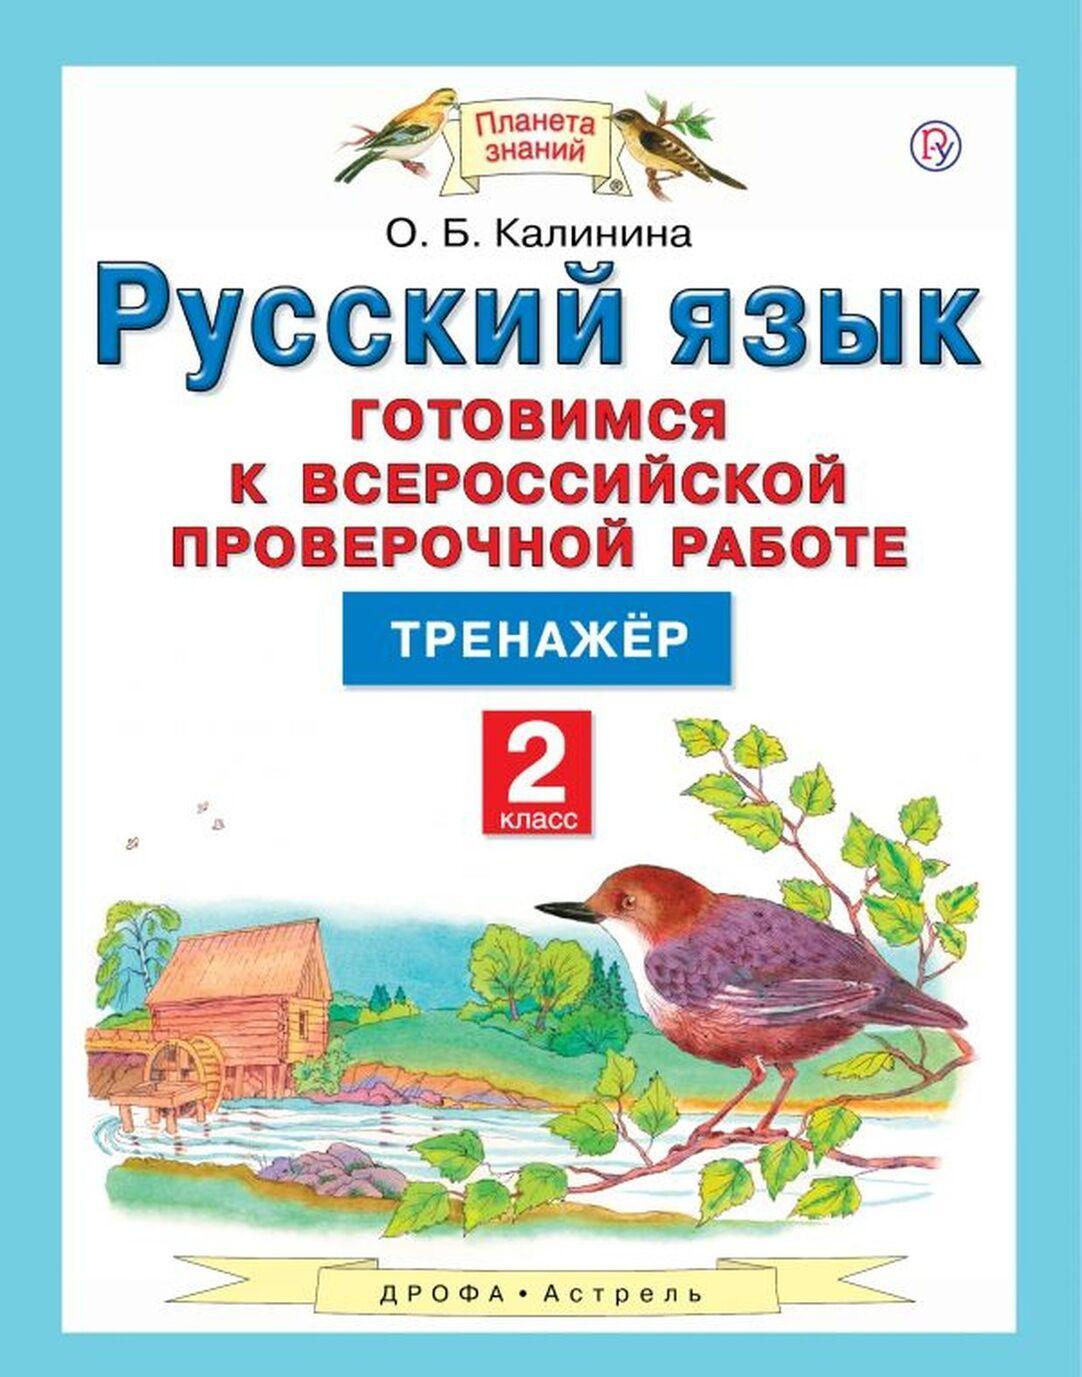 Russkij jazyk. 2 klass. Gotovimsja k Vserossijskoj proverochnoj rabote